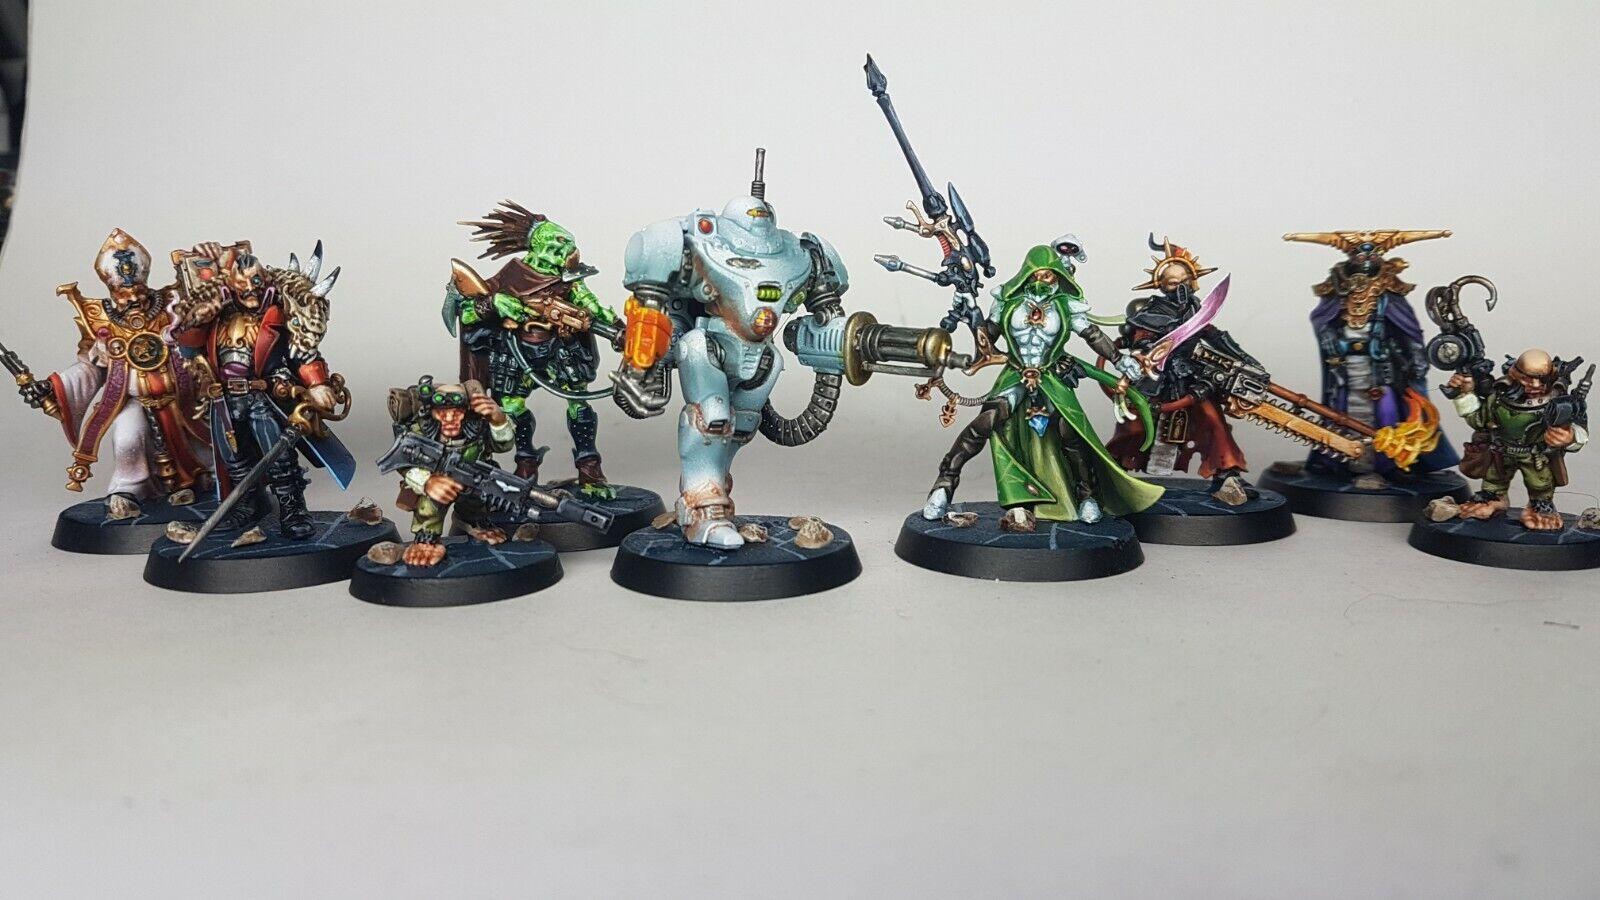 Warhammer Quest negrostone fortaleza Miniatures-PROPAINTED comisión a pedido